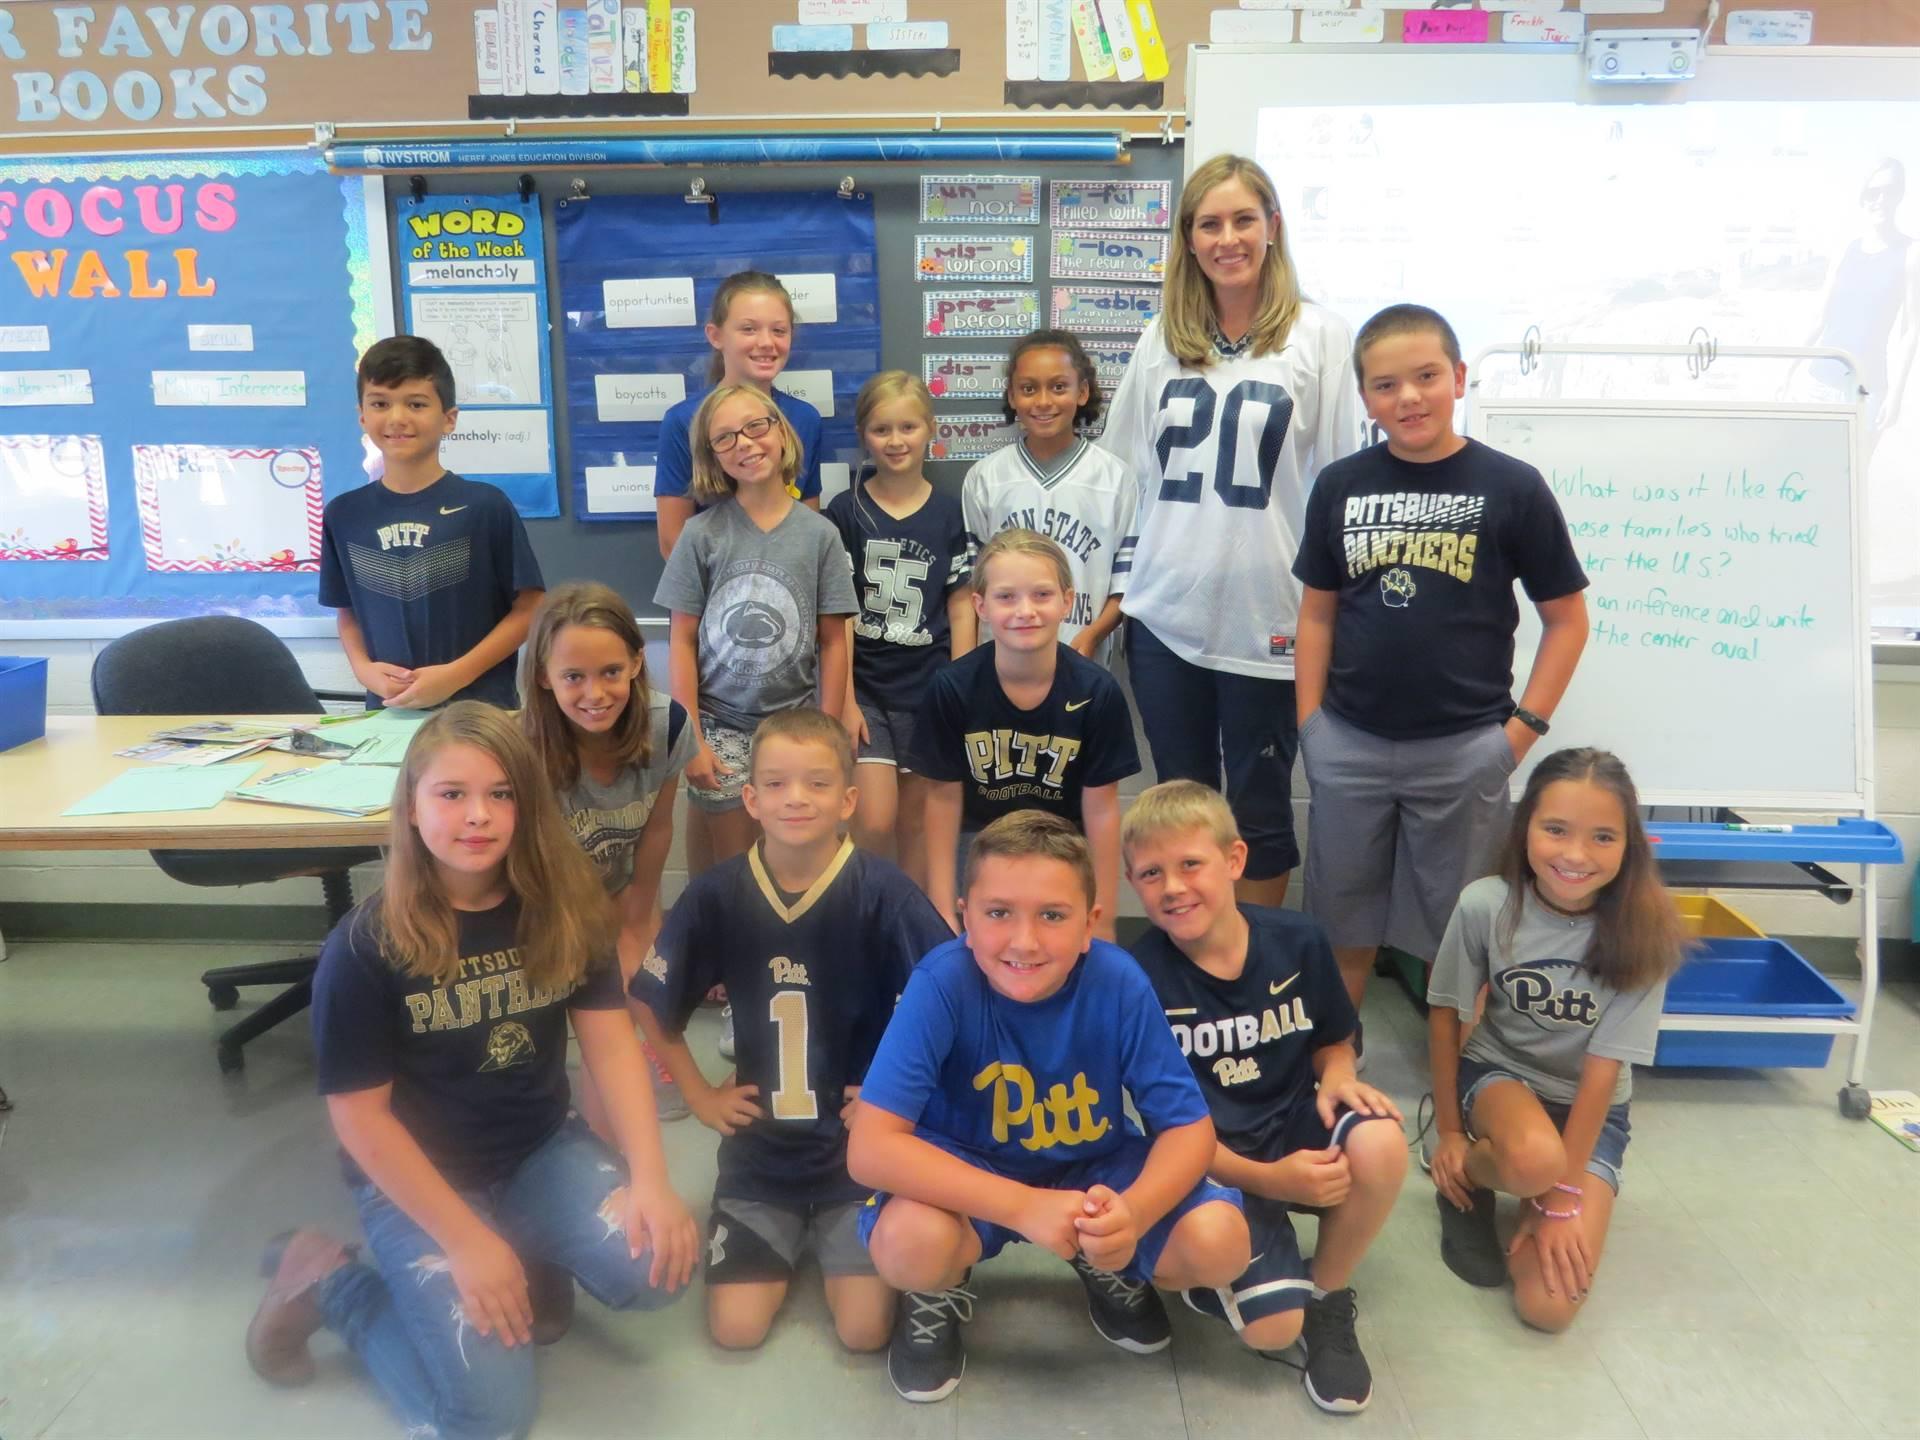 Group class photo with students wearing Pitt Penn State football jerseys